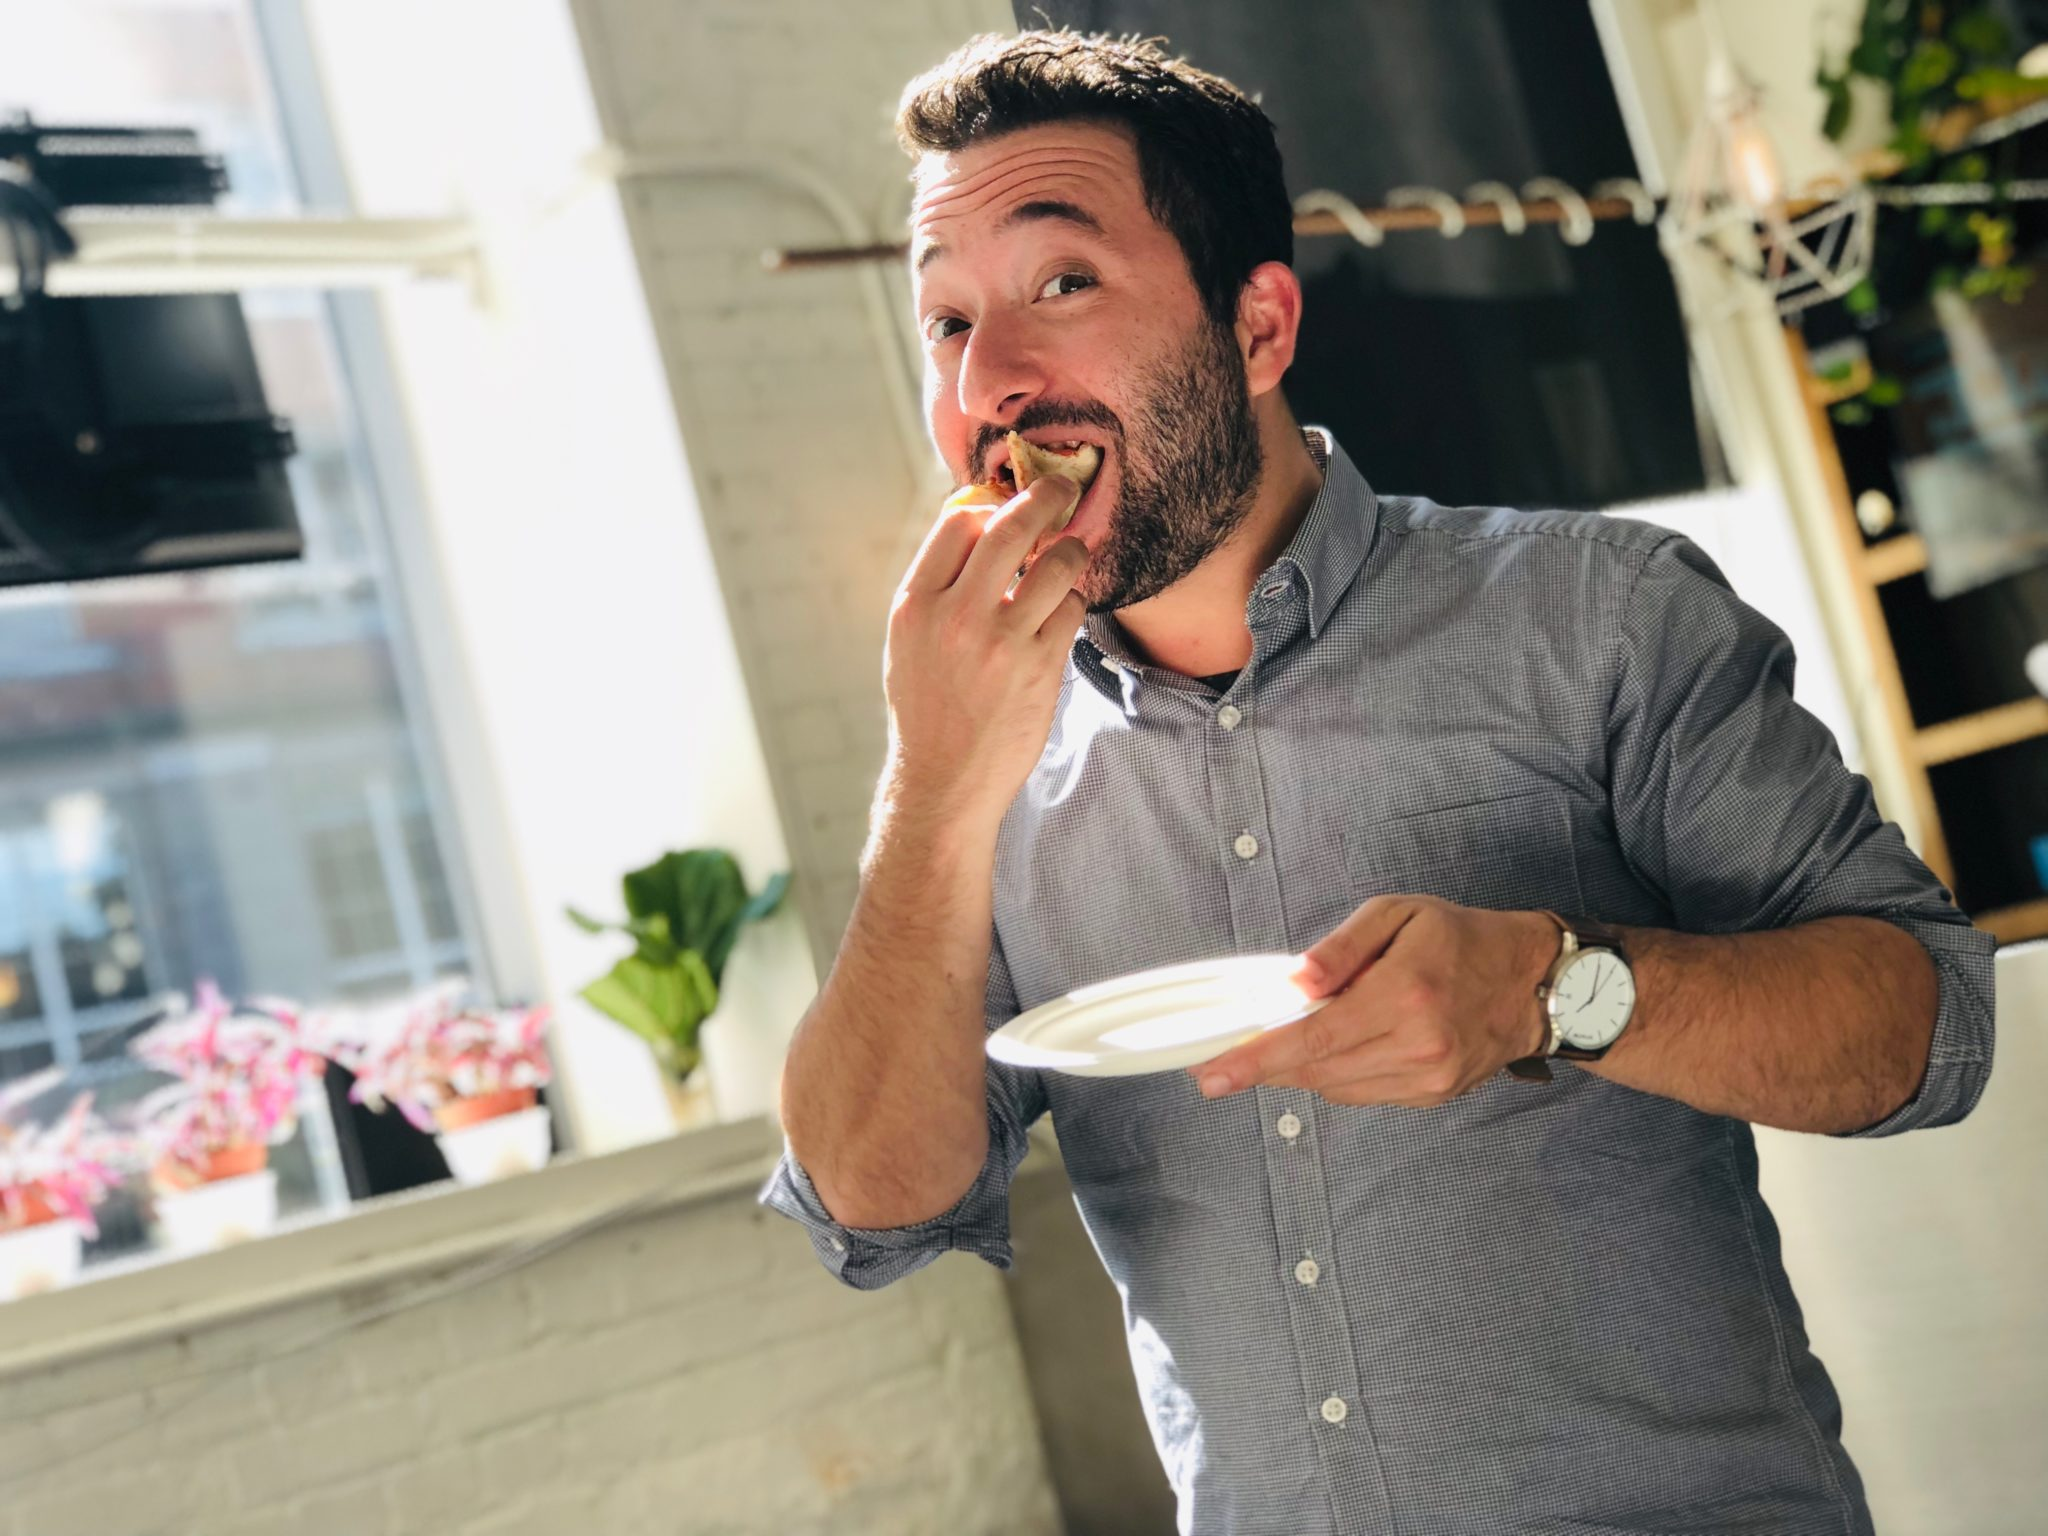 Corey Caplan - Gusto WorldWide Media (Eating Pizza at StartWell)